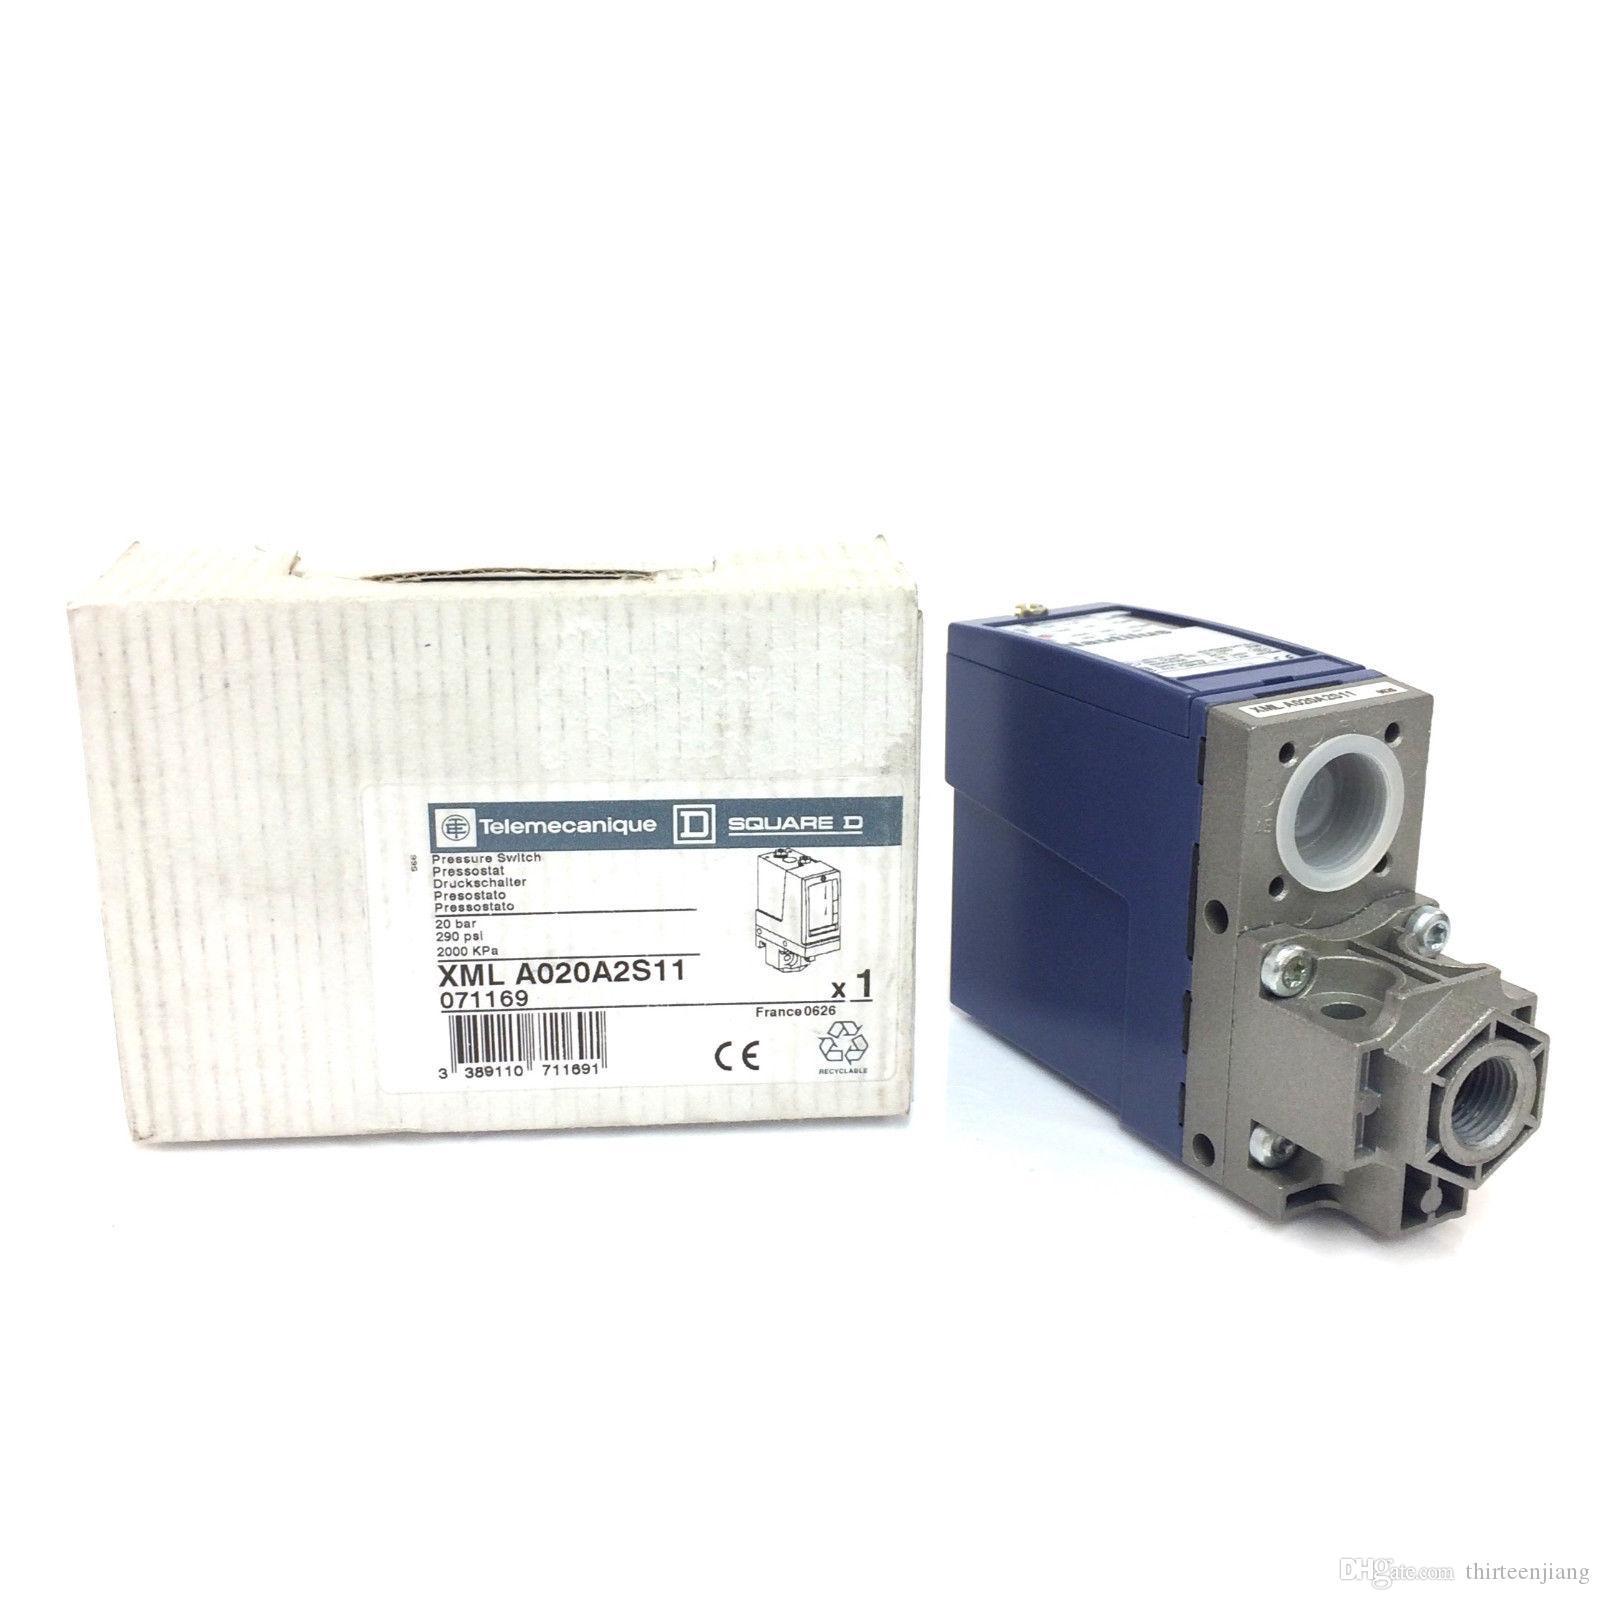 1 PC Original Schneider Telemecanique XMLA020A2S11 Nautilus Pressure Sensor New In Box Free Expedited Shipping